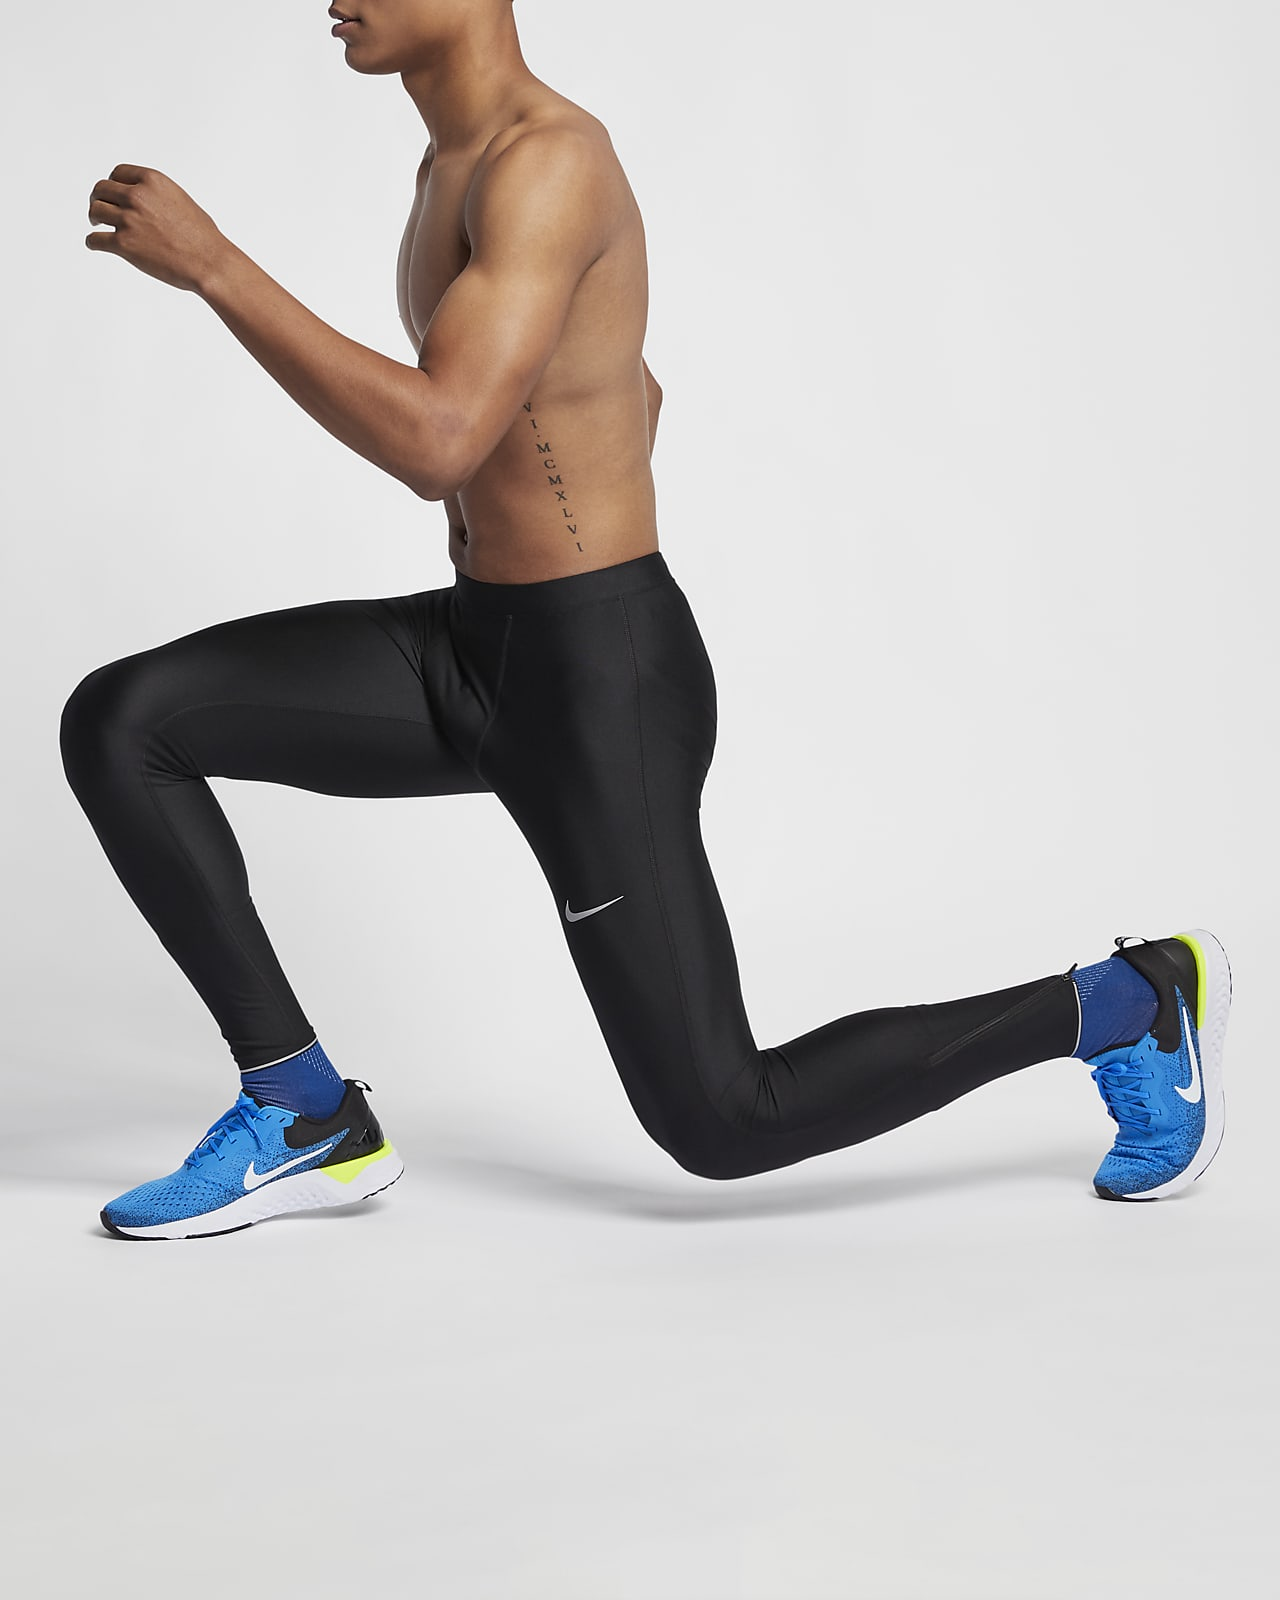 Nike 男子跑步紧身裤